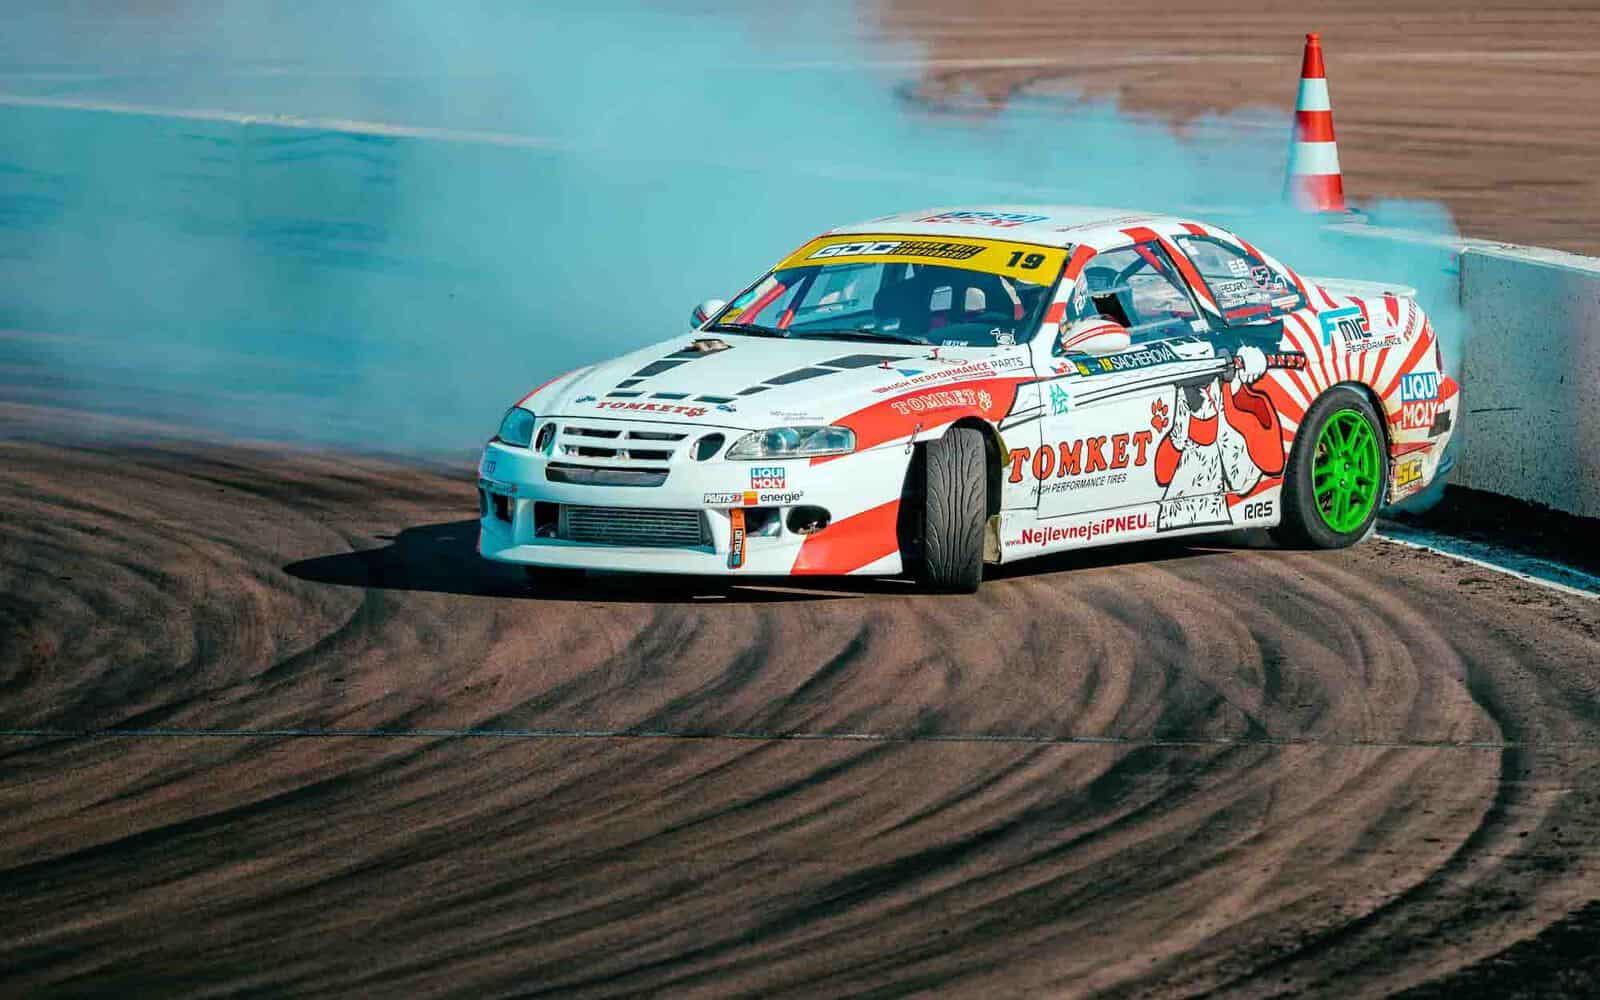 TOMKET - drift